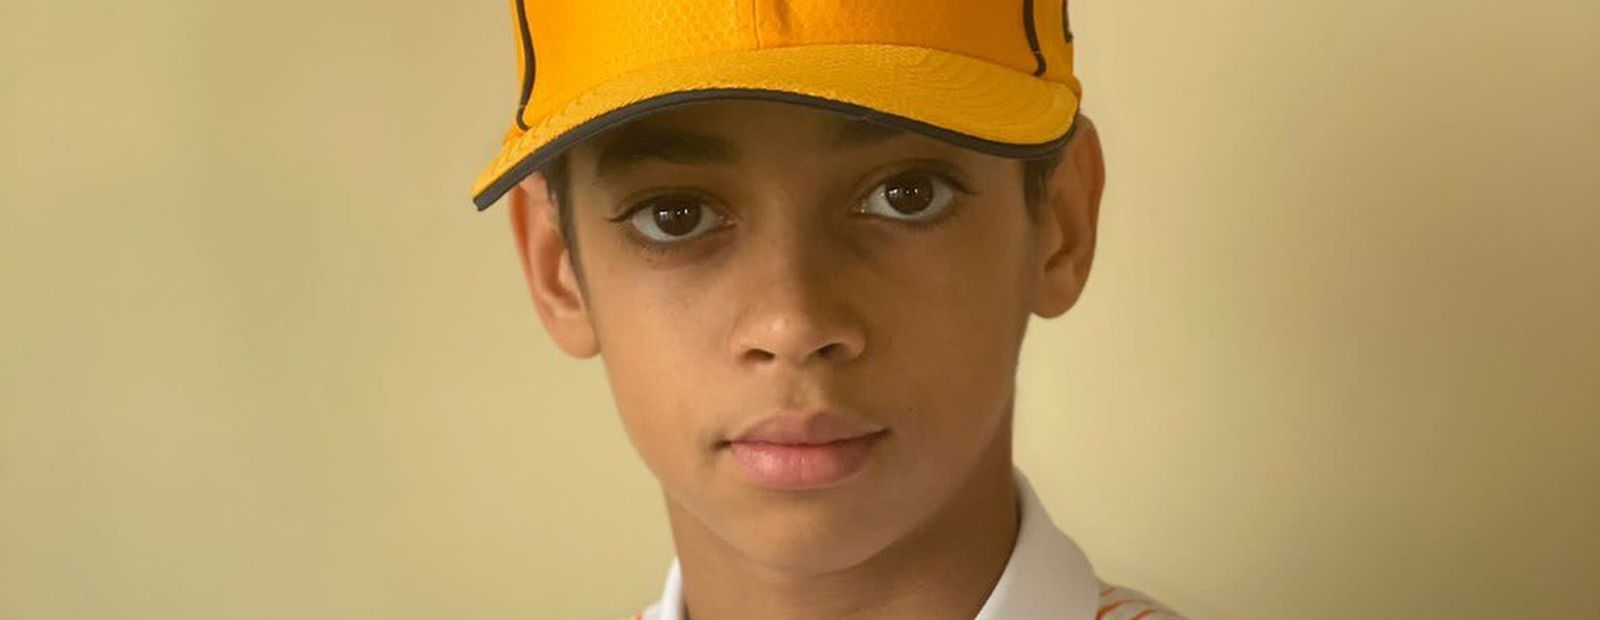 McLaren Racing signs agreement with rising karting star Ugo Ugochukwu